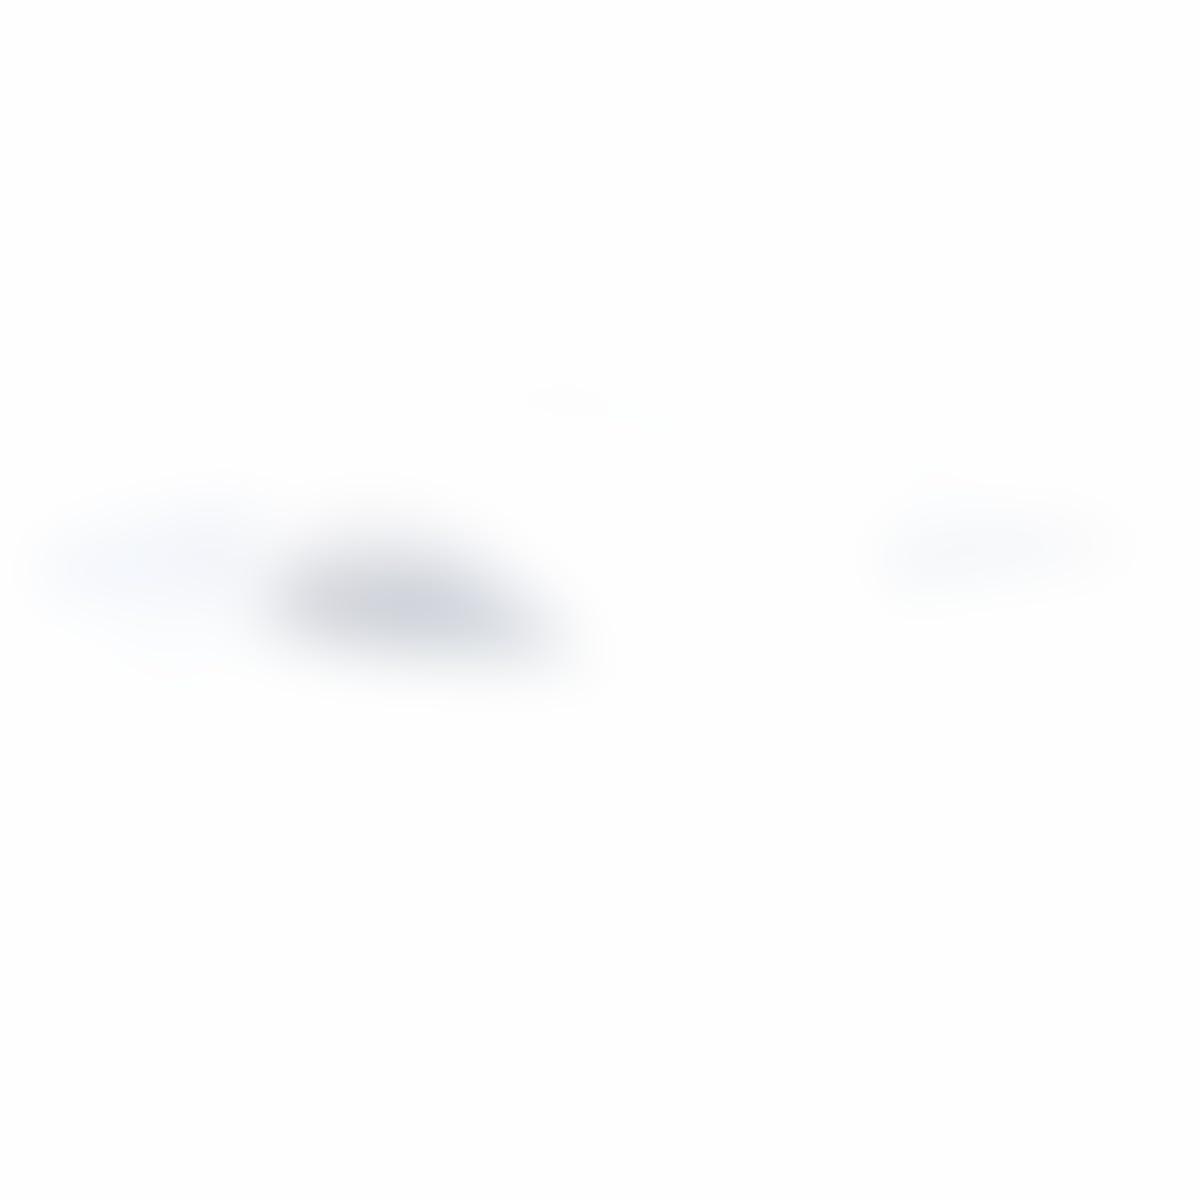 ab6bb3c18034 Amazon.com  Swarovski NIKE Slides